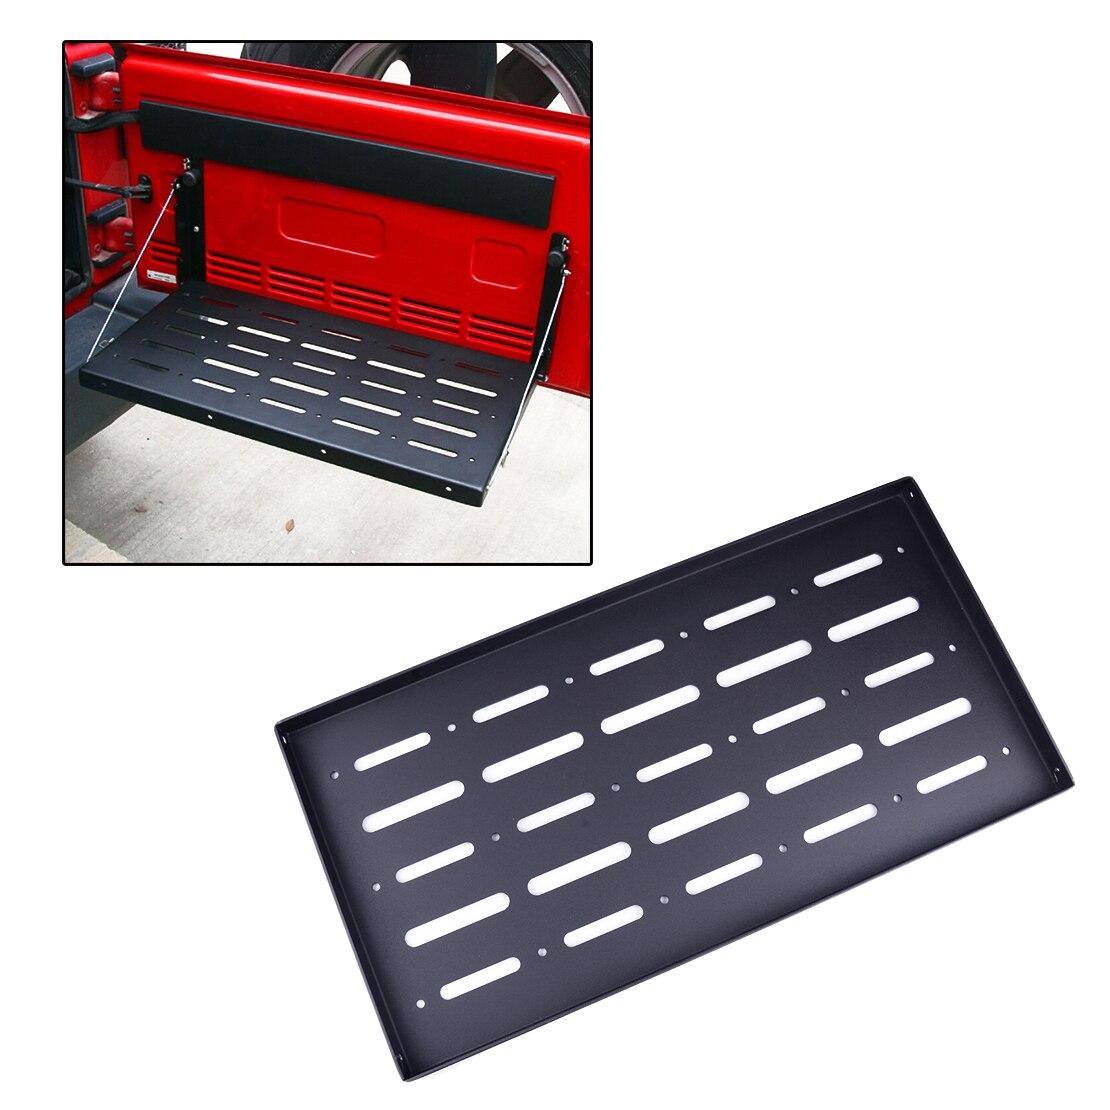 Puerta trasera plegable, soporte de almacenamiento de carga, soporte de mesa, soporte de almacenamiento de Metal para Jeep Wrangler JK 2007-2015 2016 2017